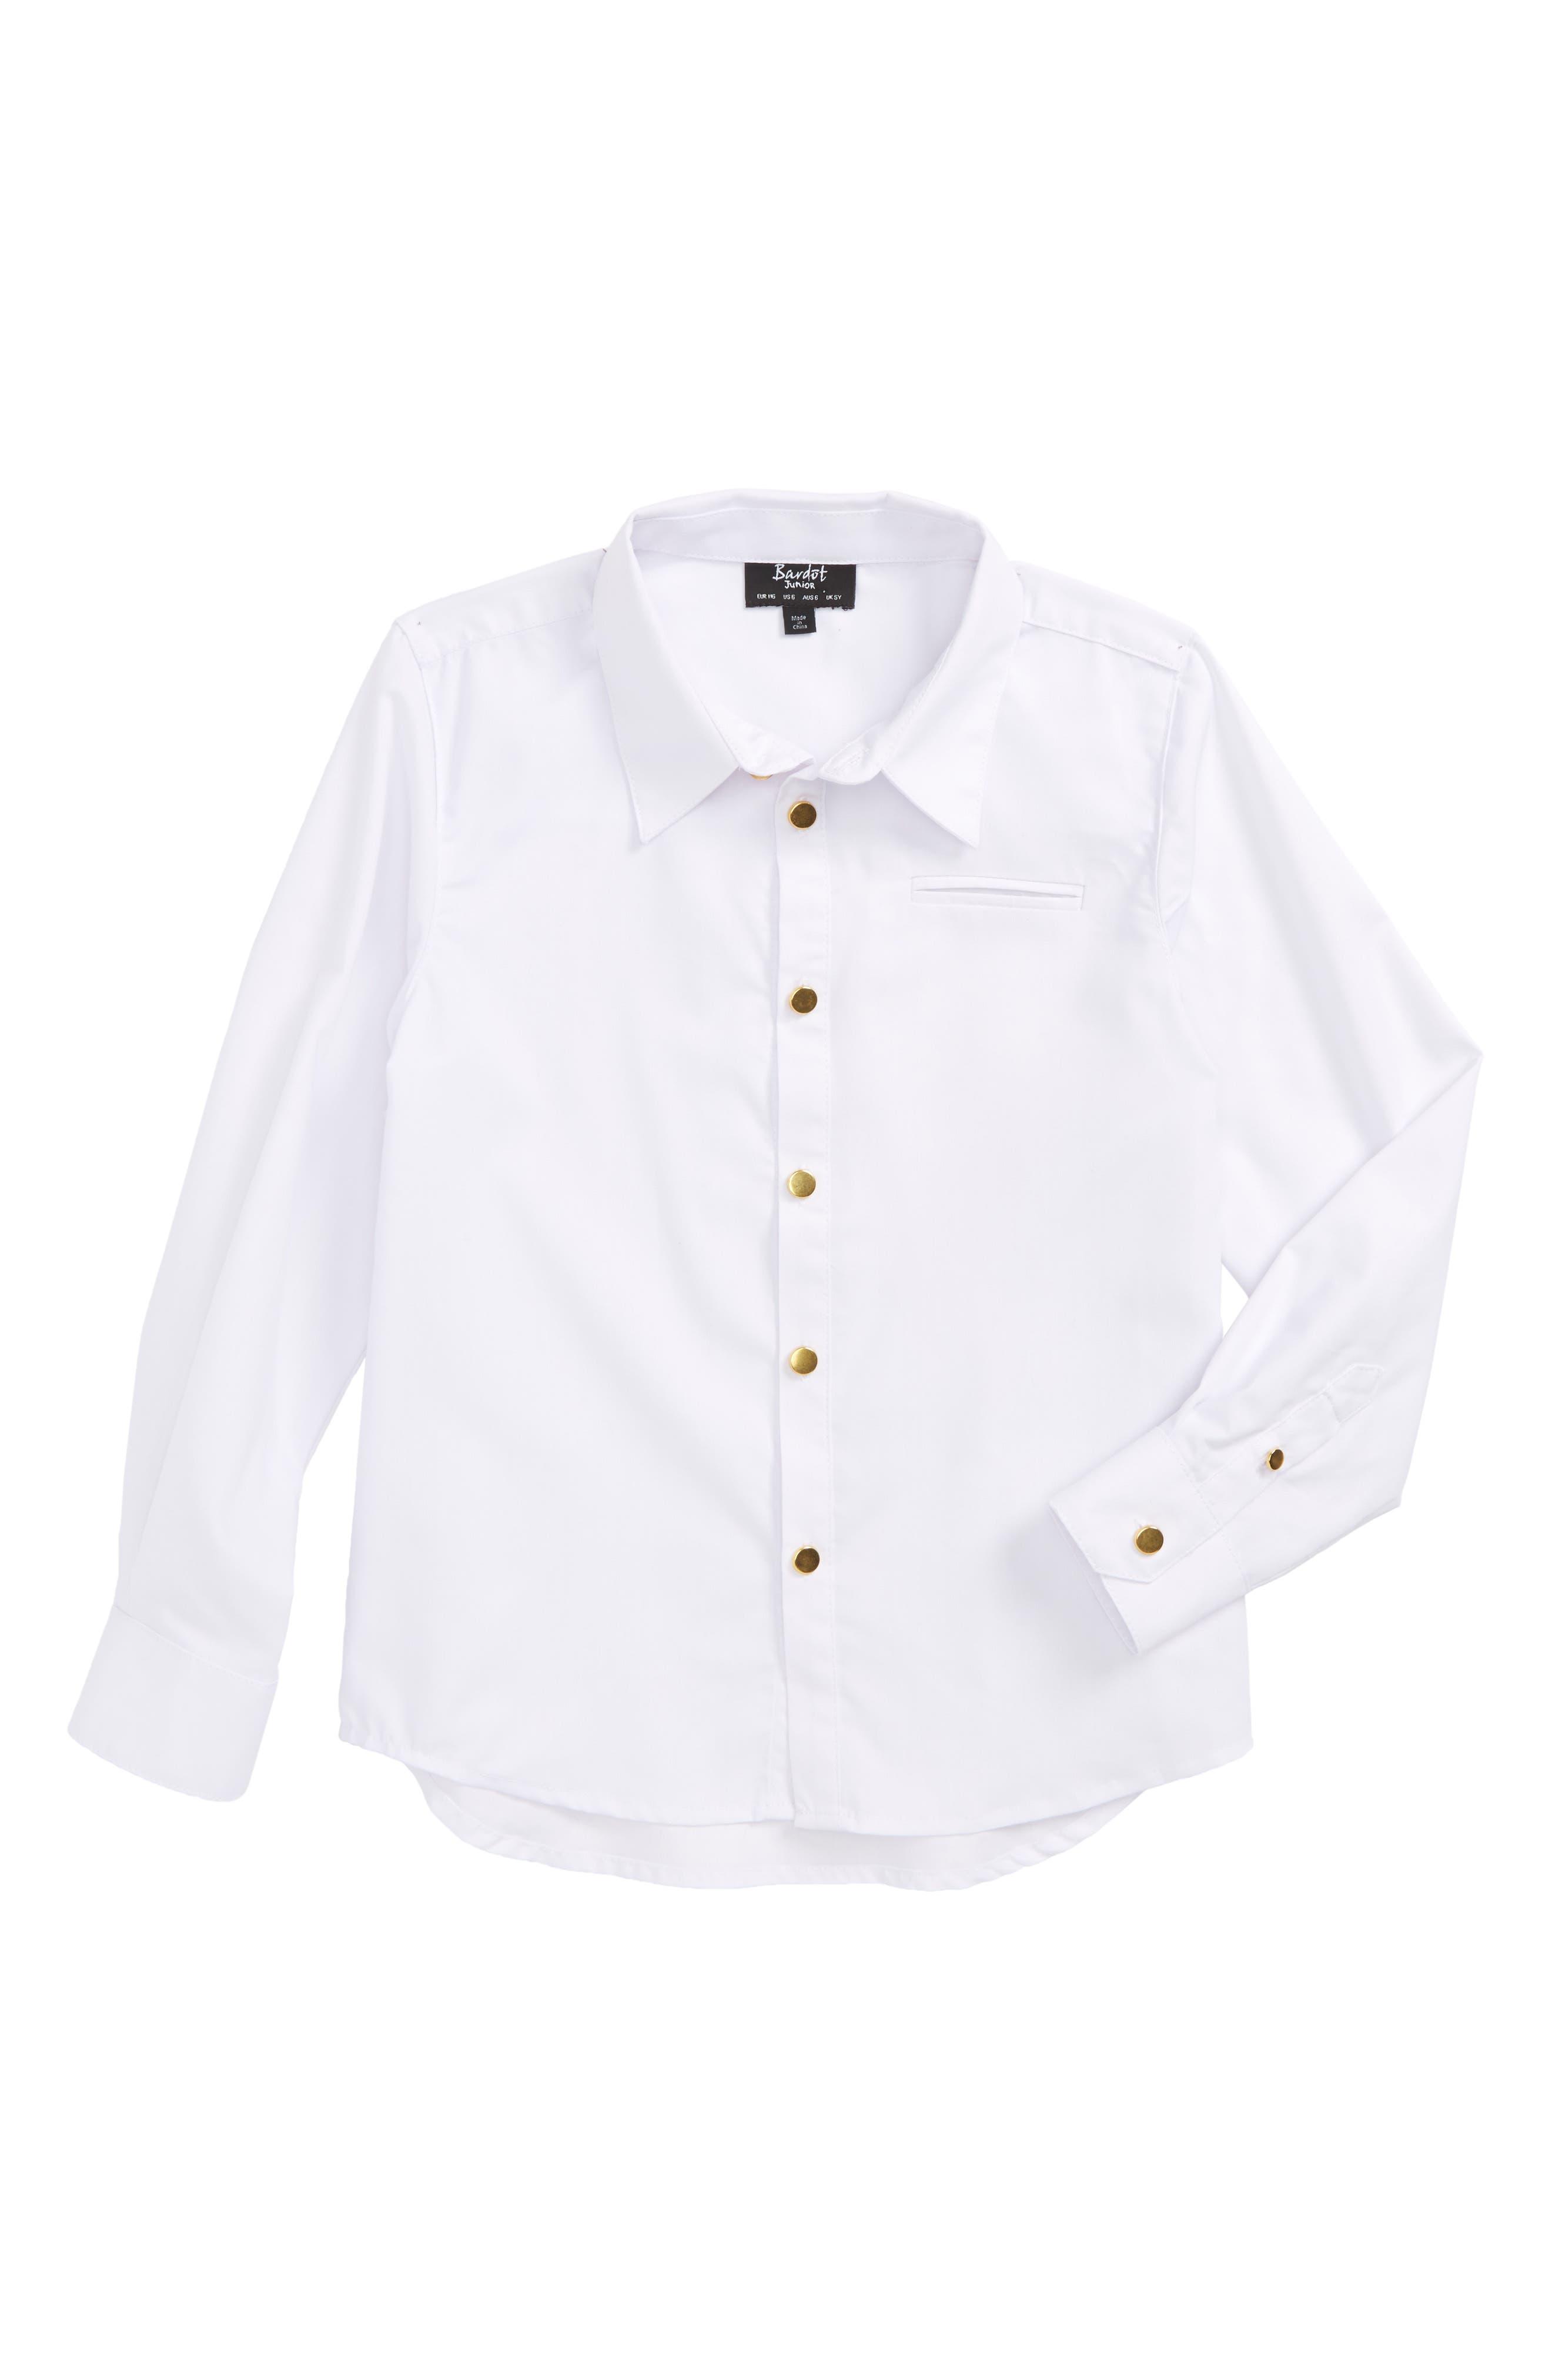 Main Image - Bardot Junior Goldtone Button Shirt (Toddler Boys & Little Boys)